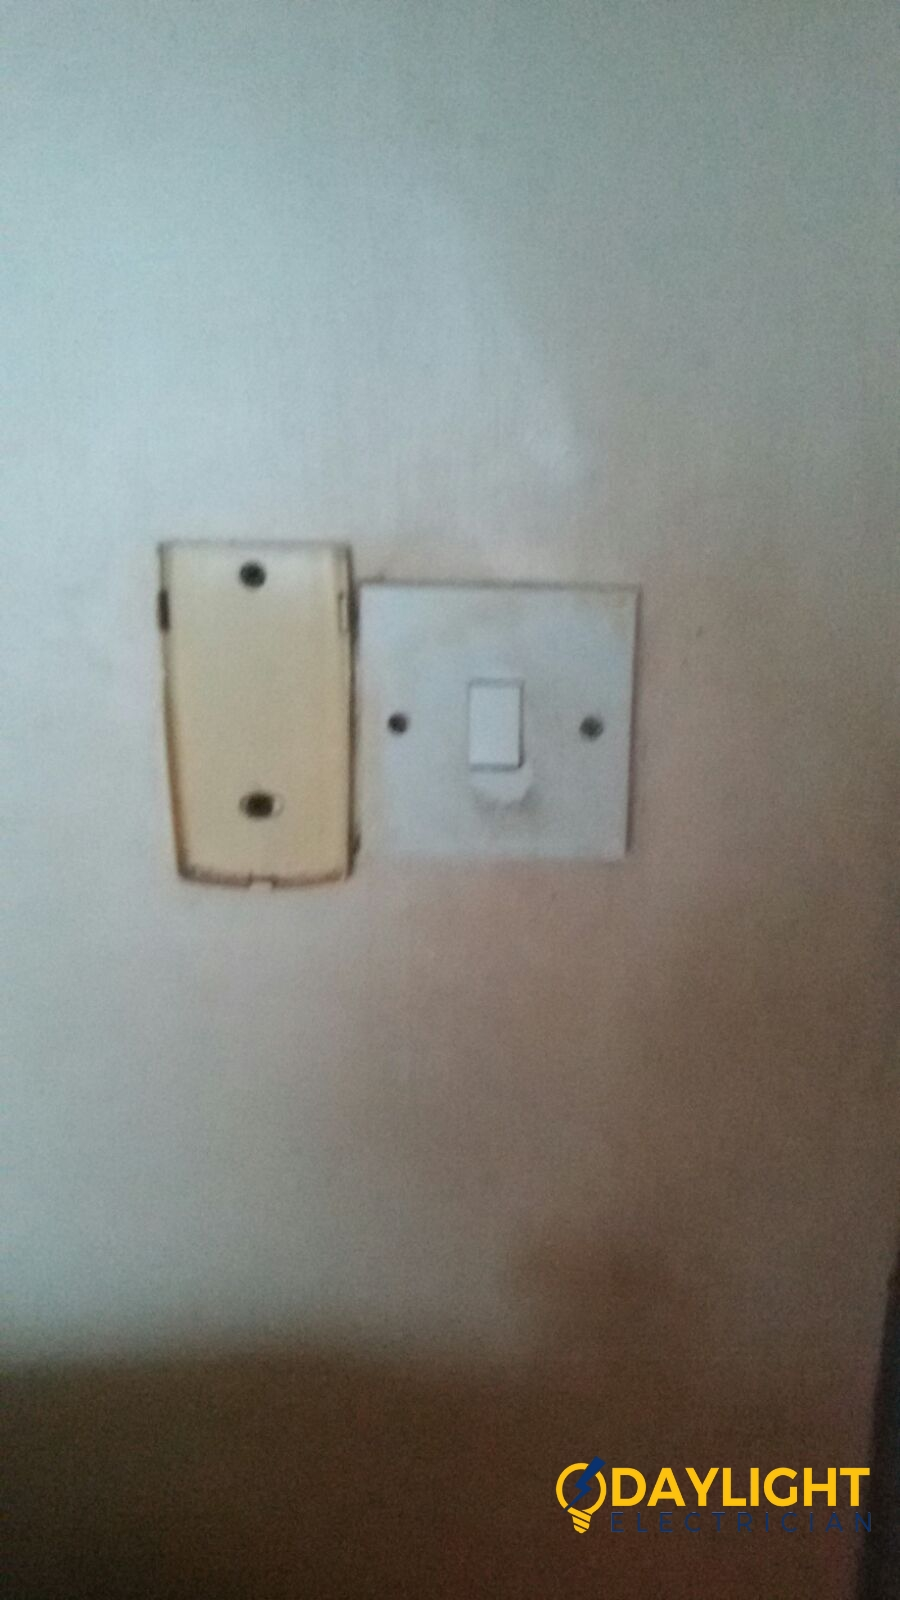 replace-light-switch-electrician-singapore-bedok-hdb-3